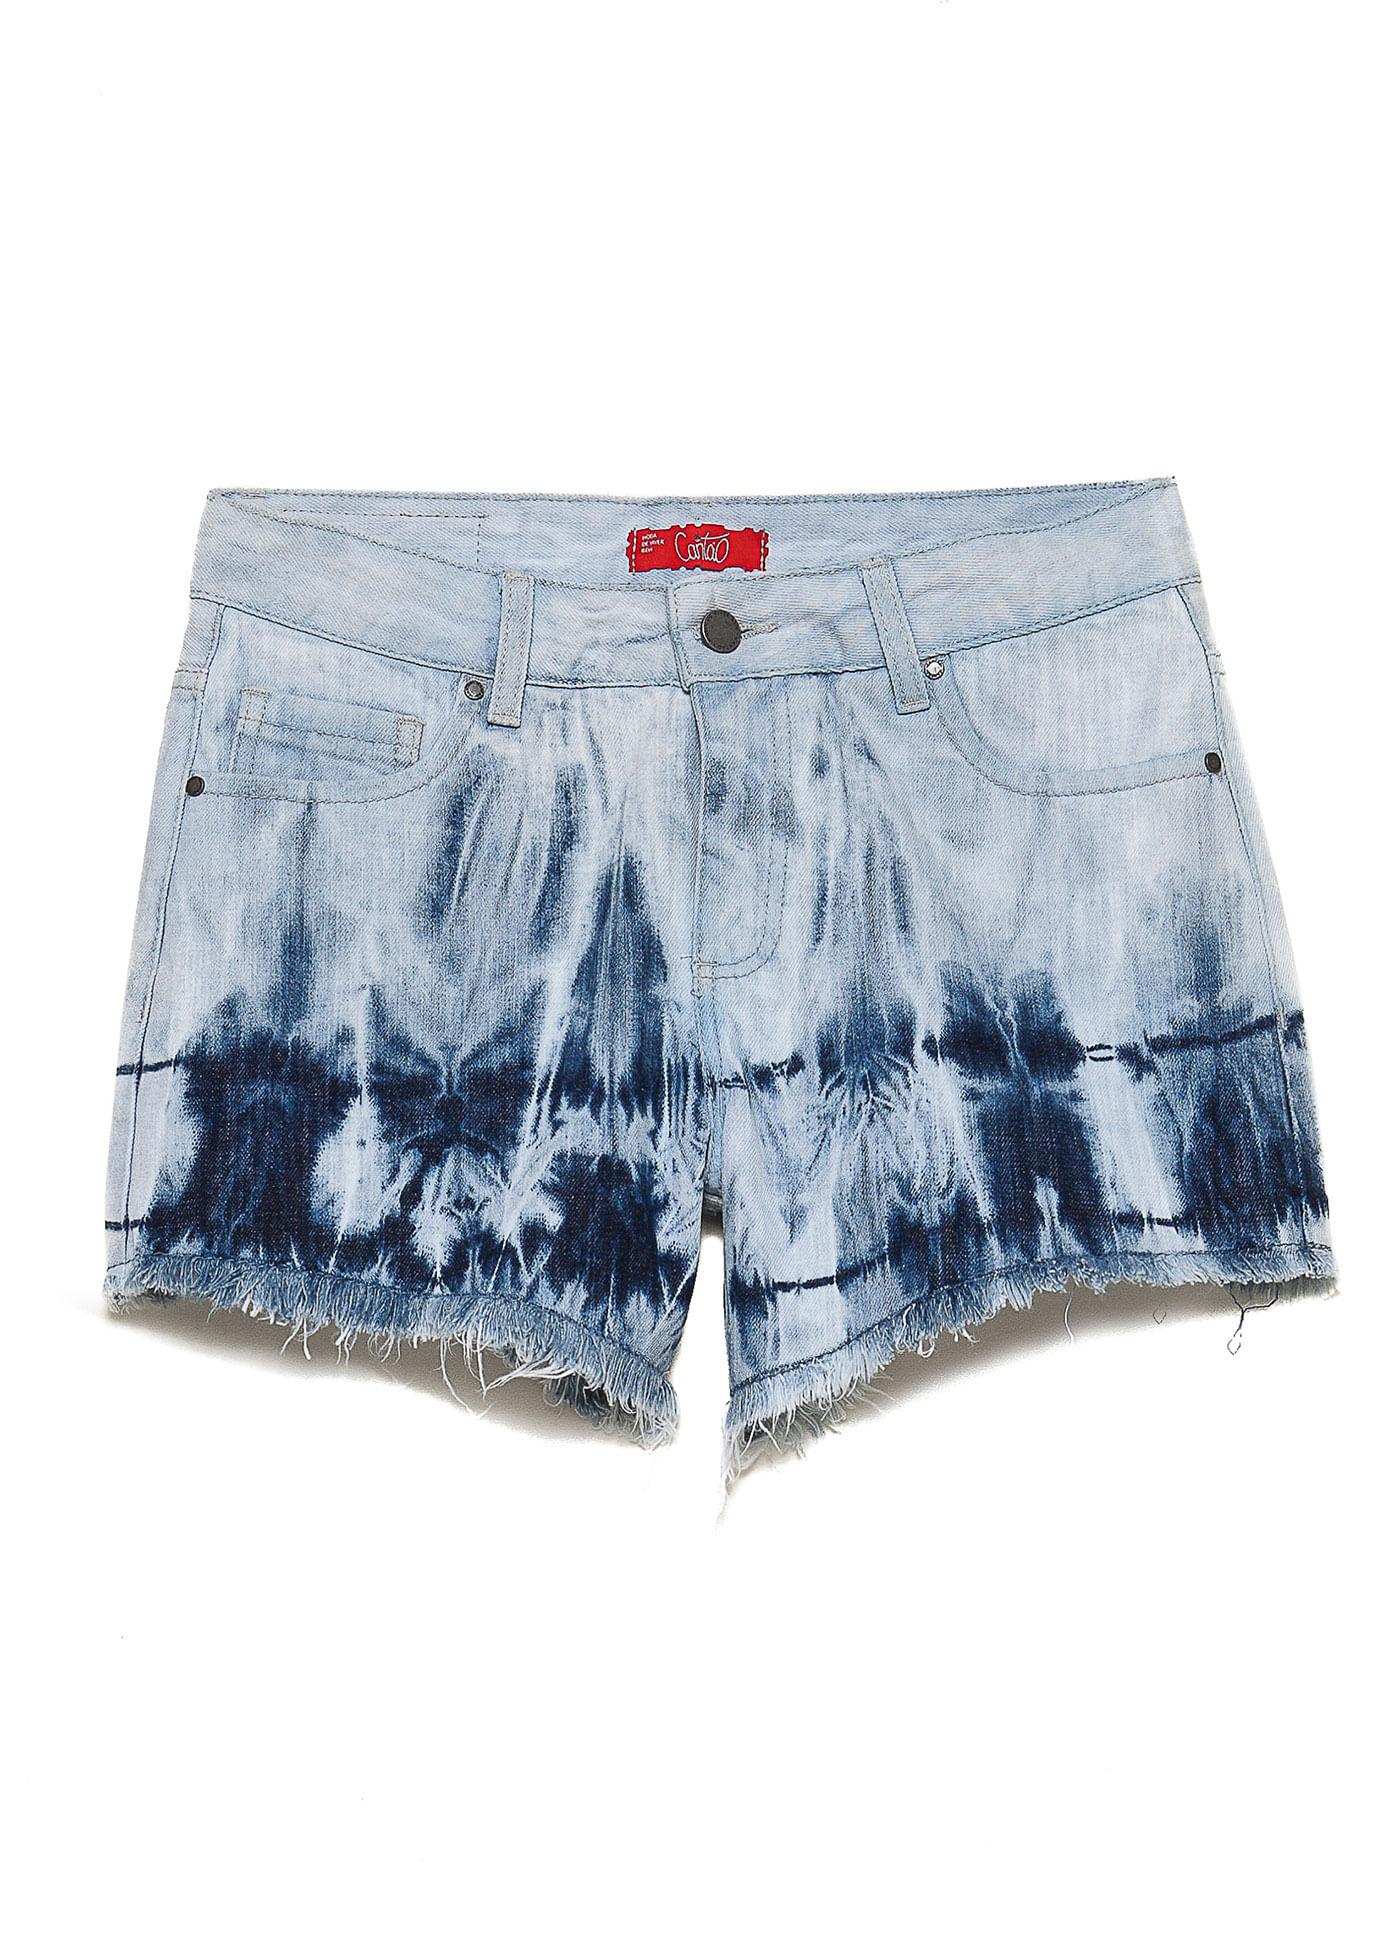 Short jeans tie dye barra jeans compre online na canto short jeans tie dye barra jeans ccuart Choice Image